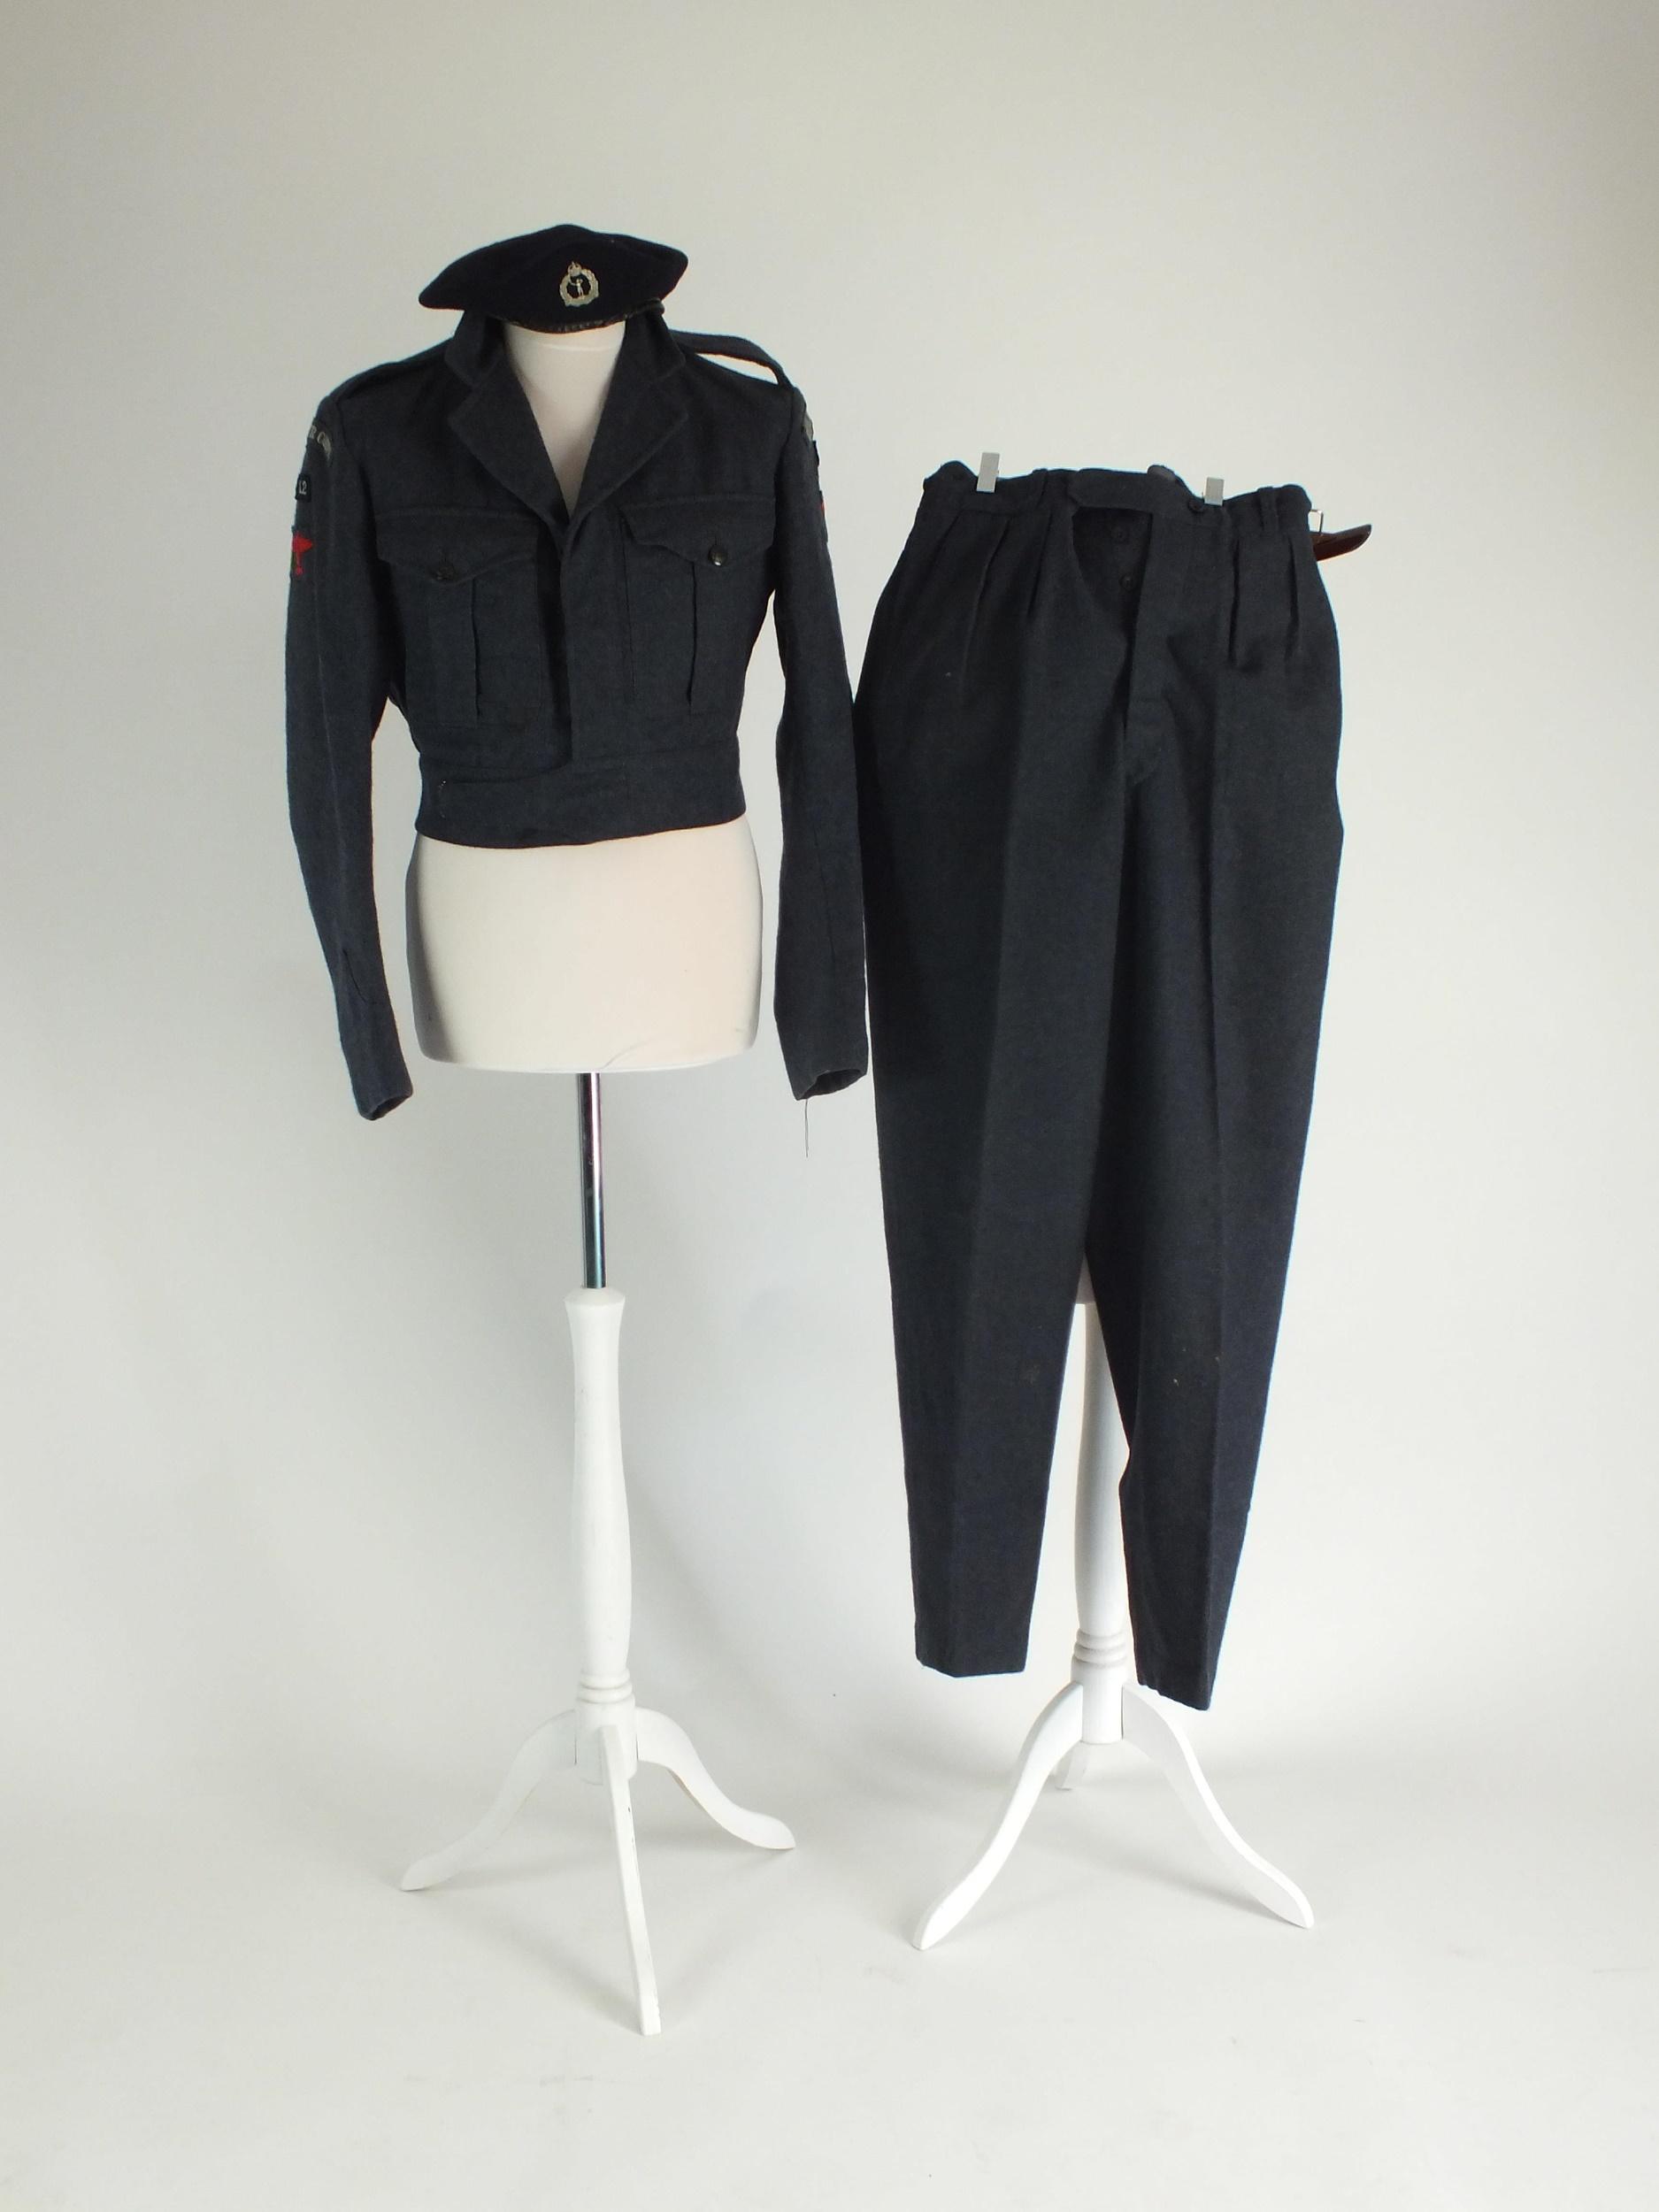 Royal Observer Corps uniform